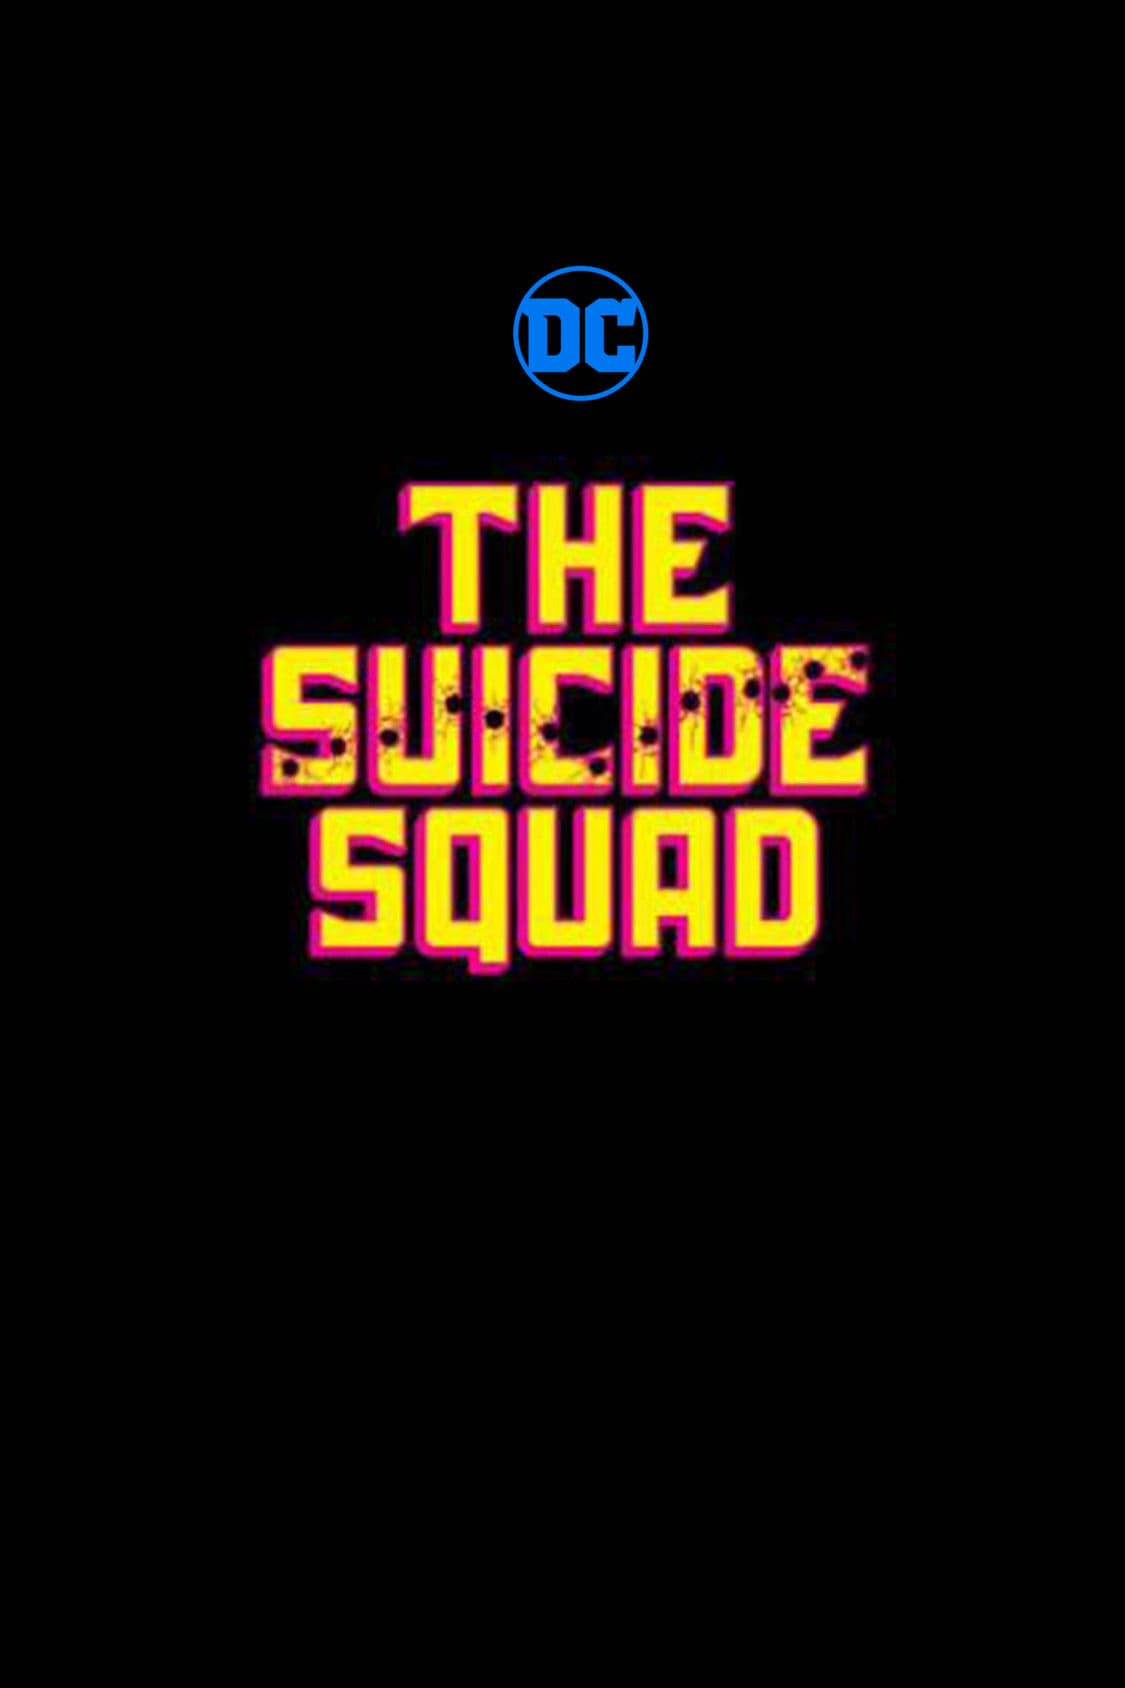 Постер фильма Отряд самоубийц 2 The Suicide Squad 2021